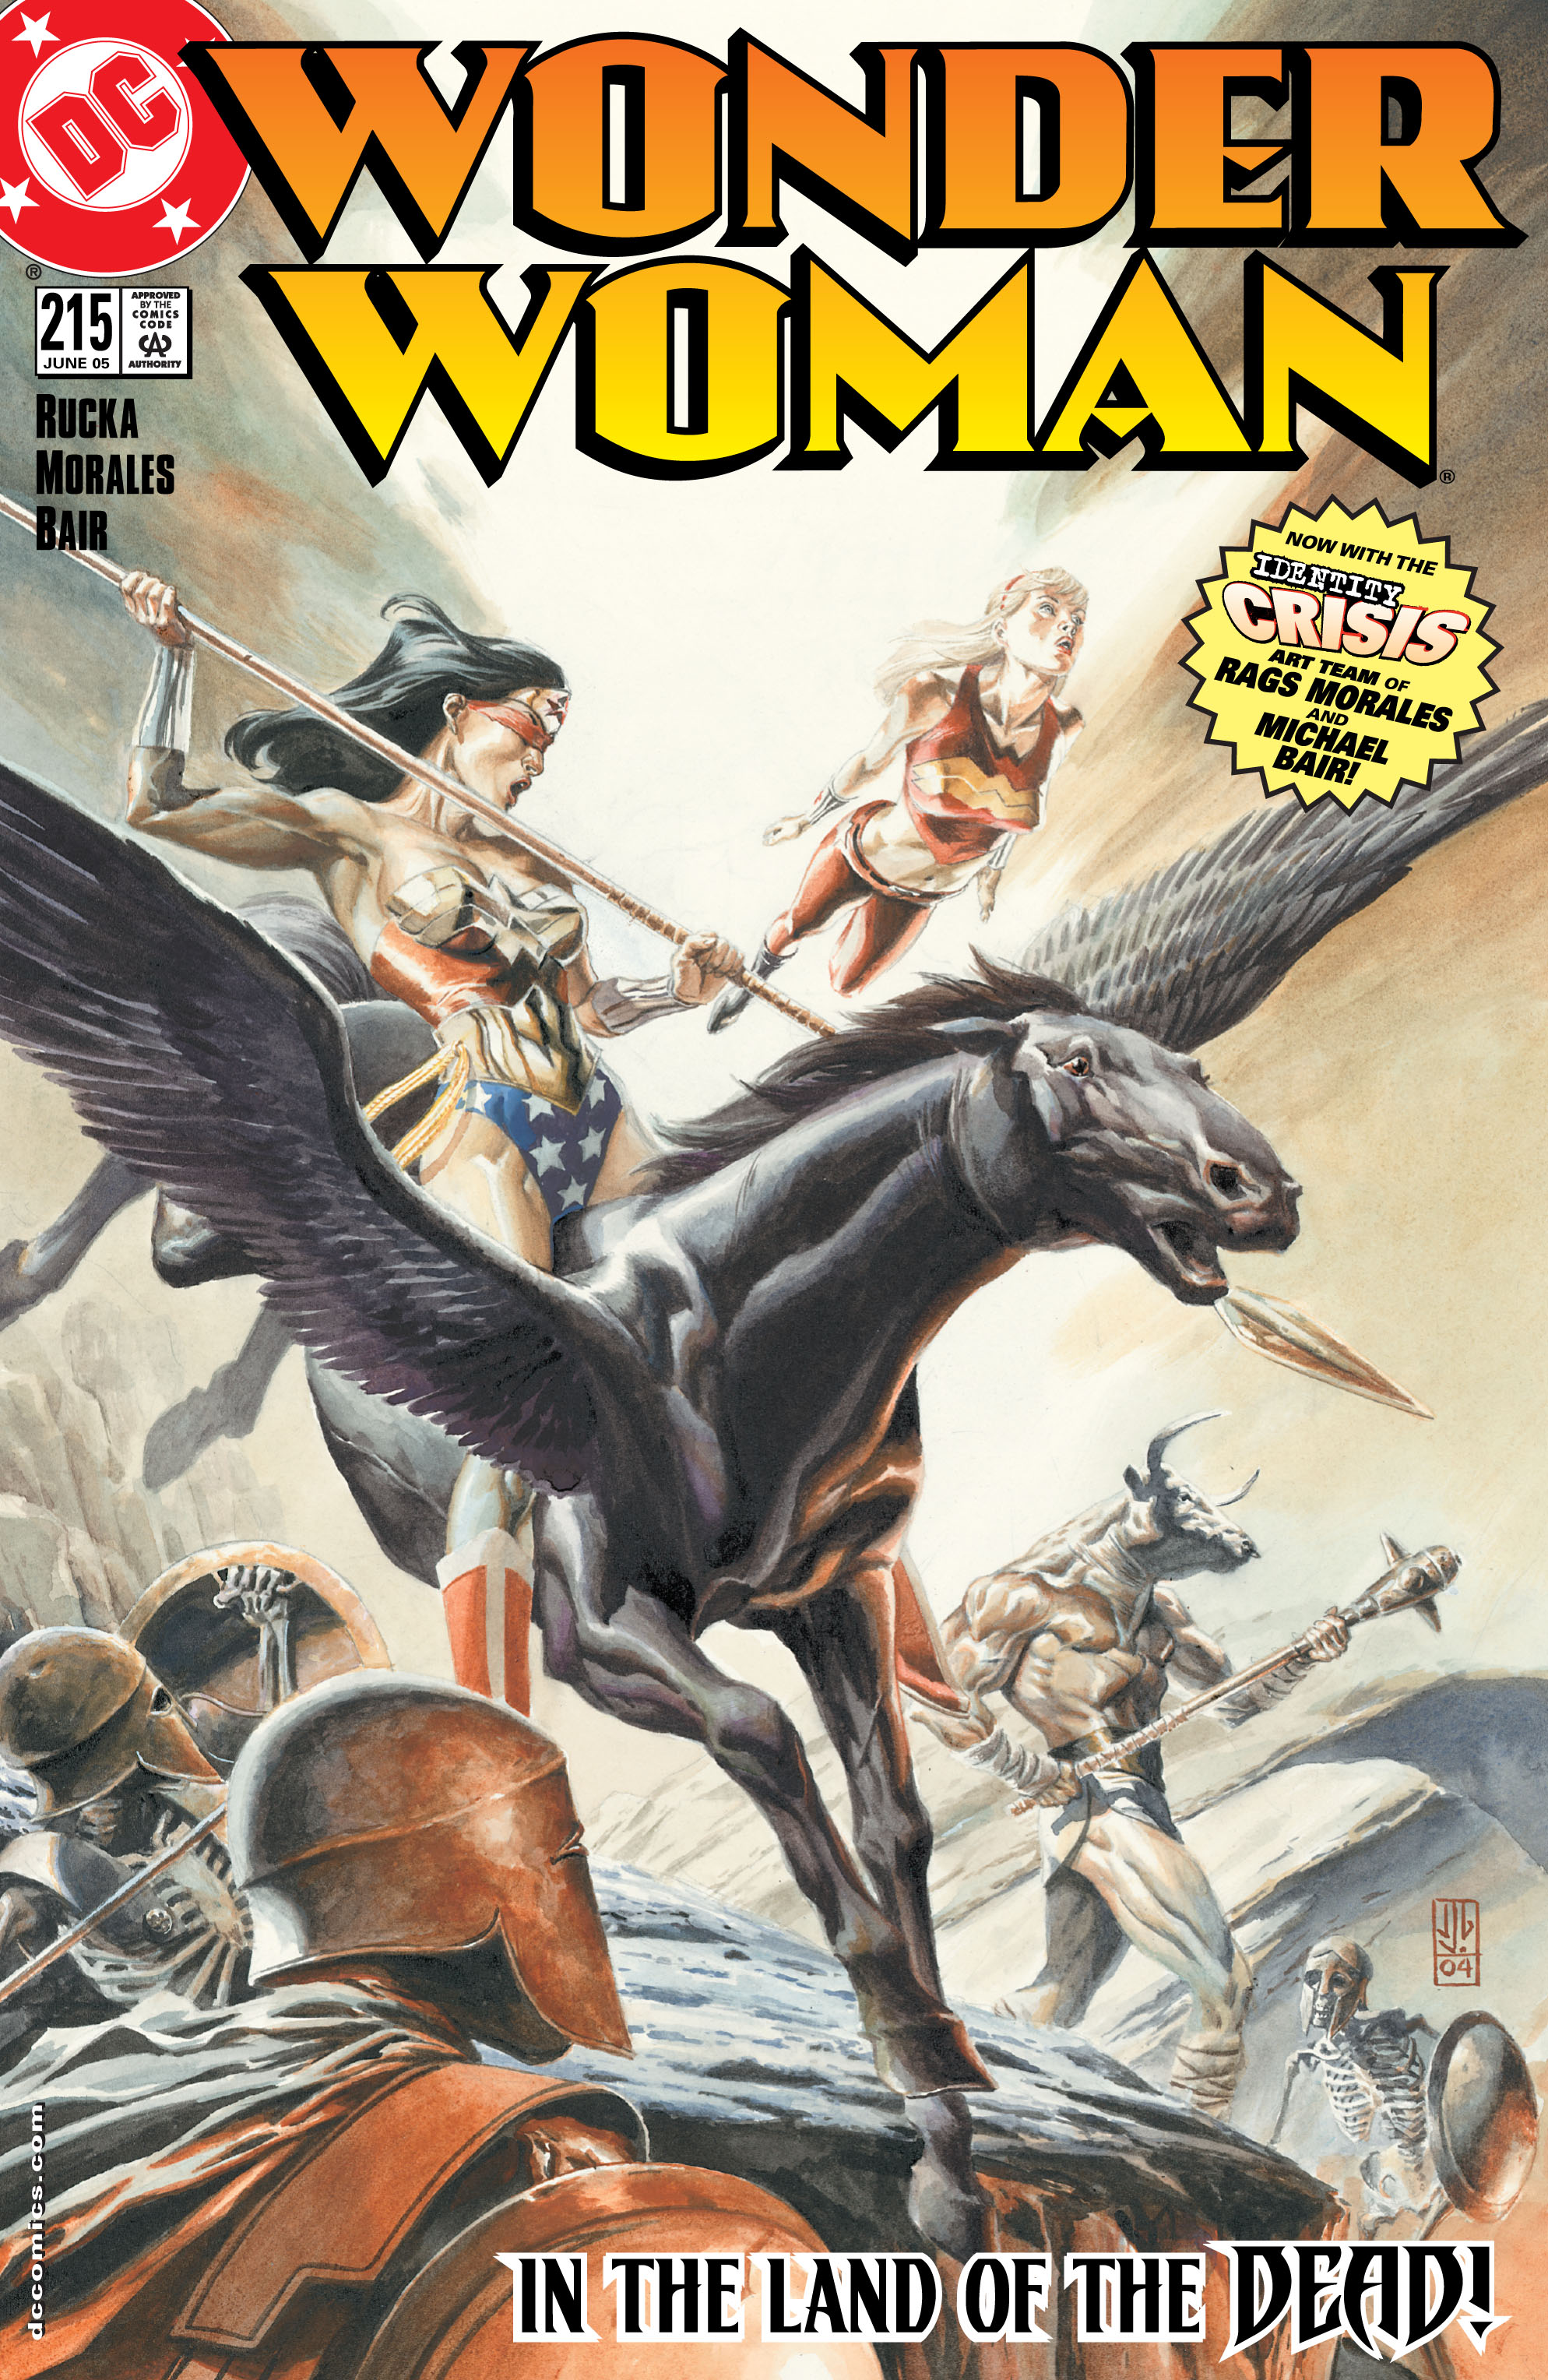 Read online Wonder Woman (1987) comic -  Issue #215 - 1